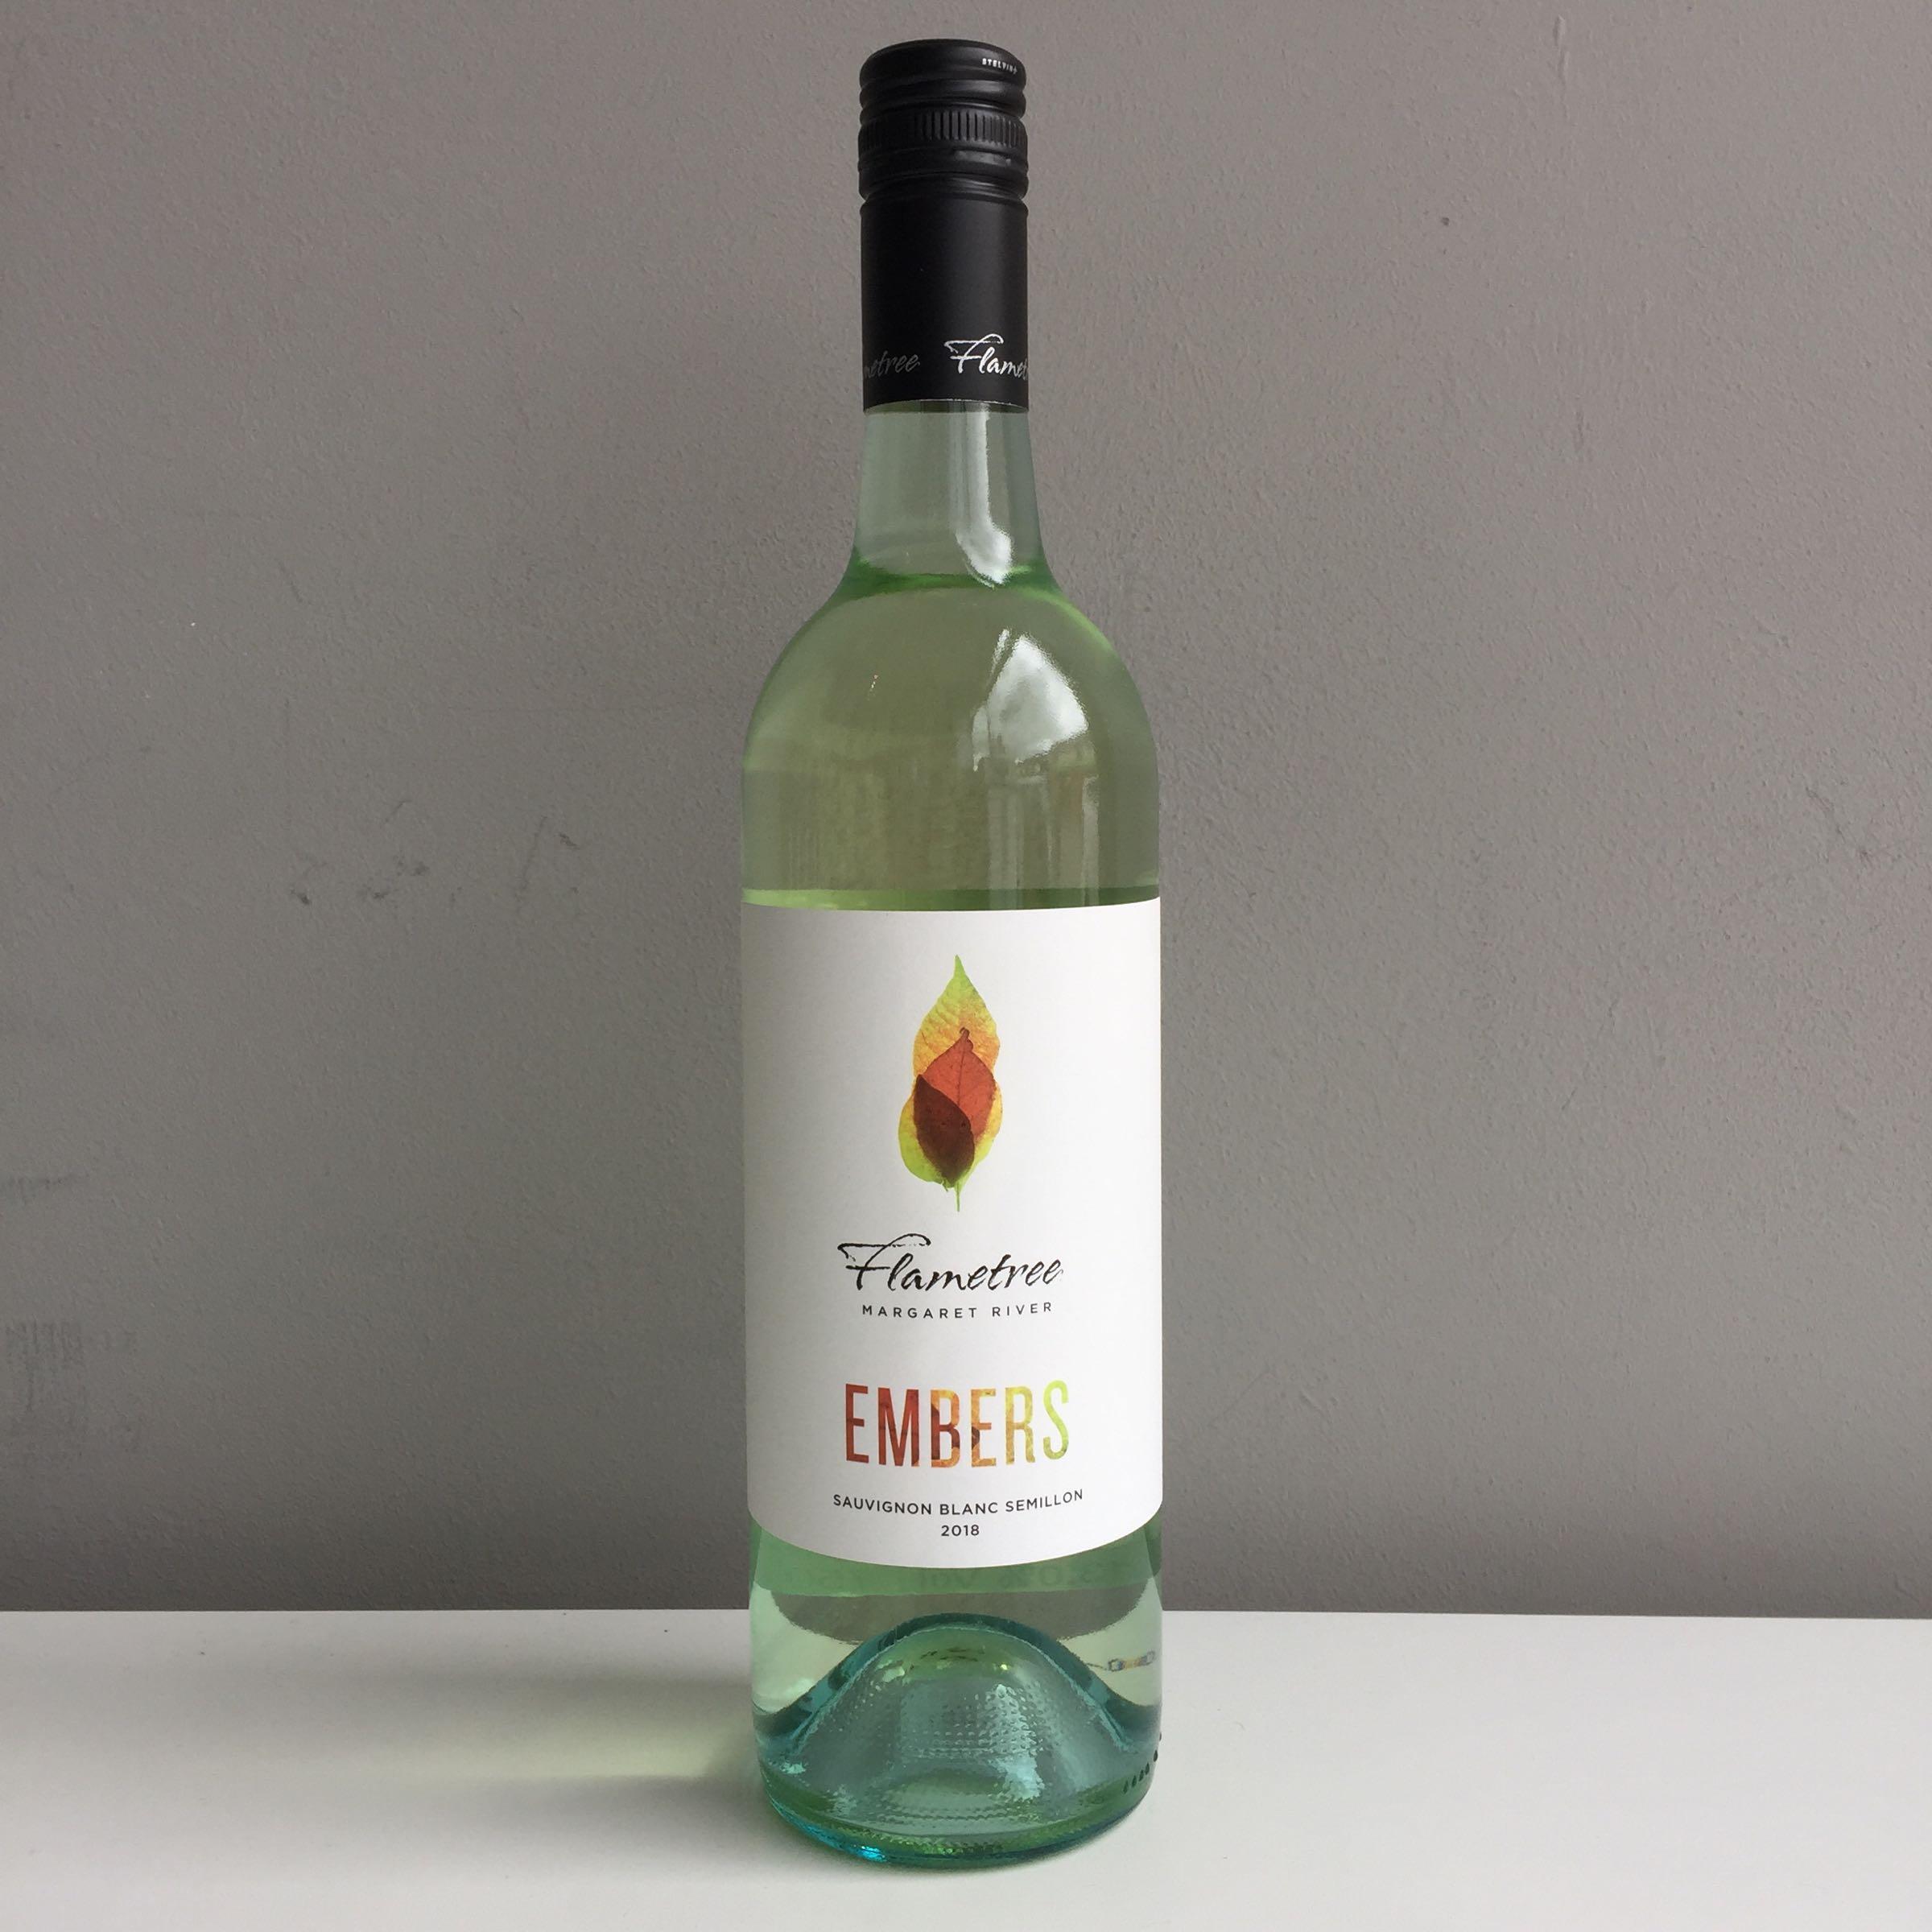 Flametree Embers -  Sauvignon Blanc, Semillon